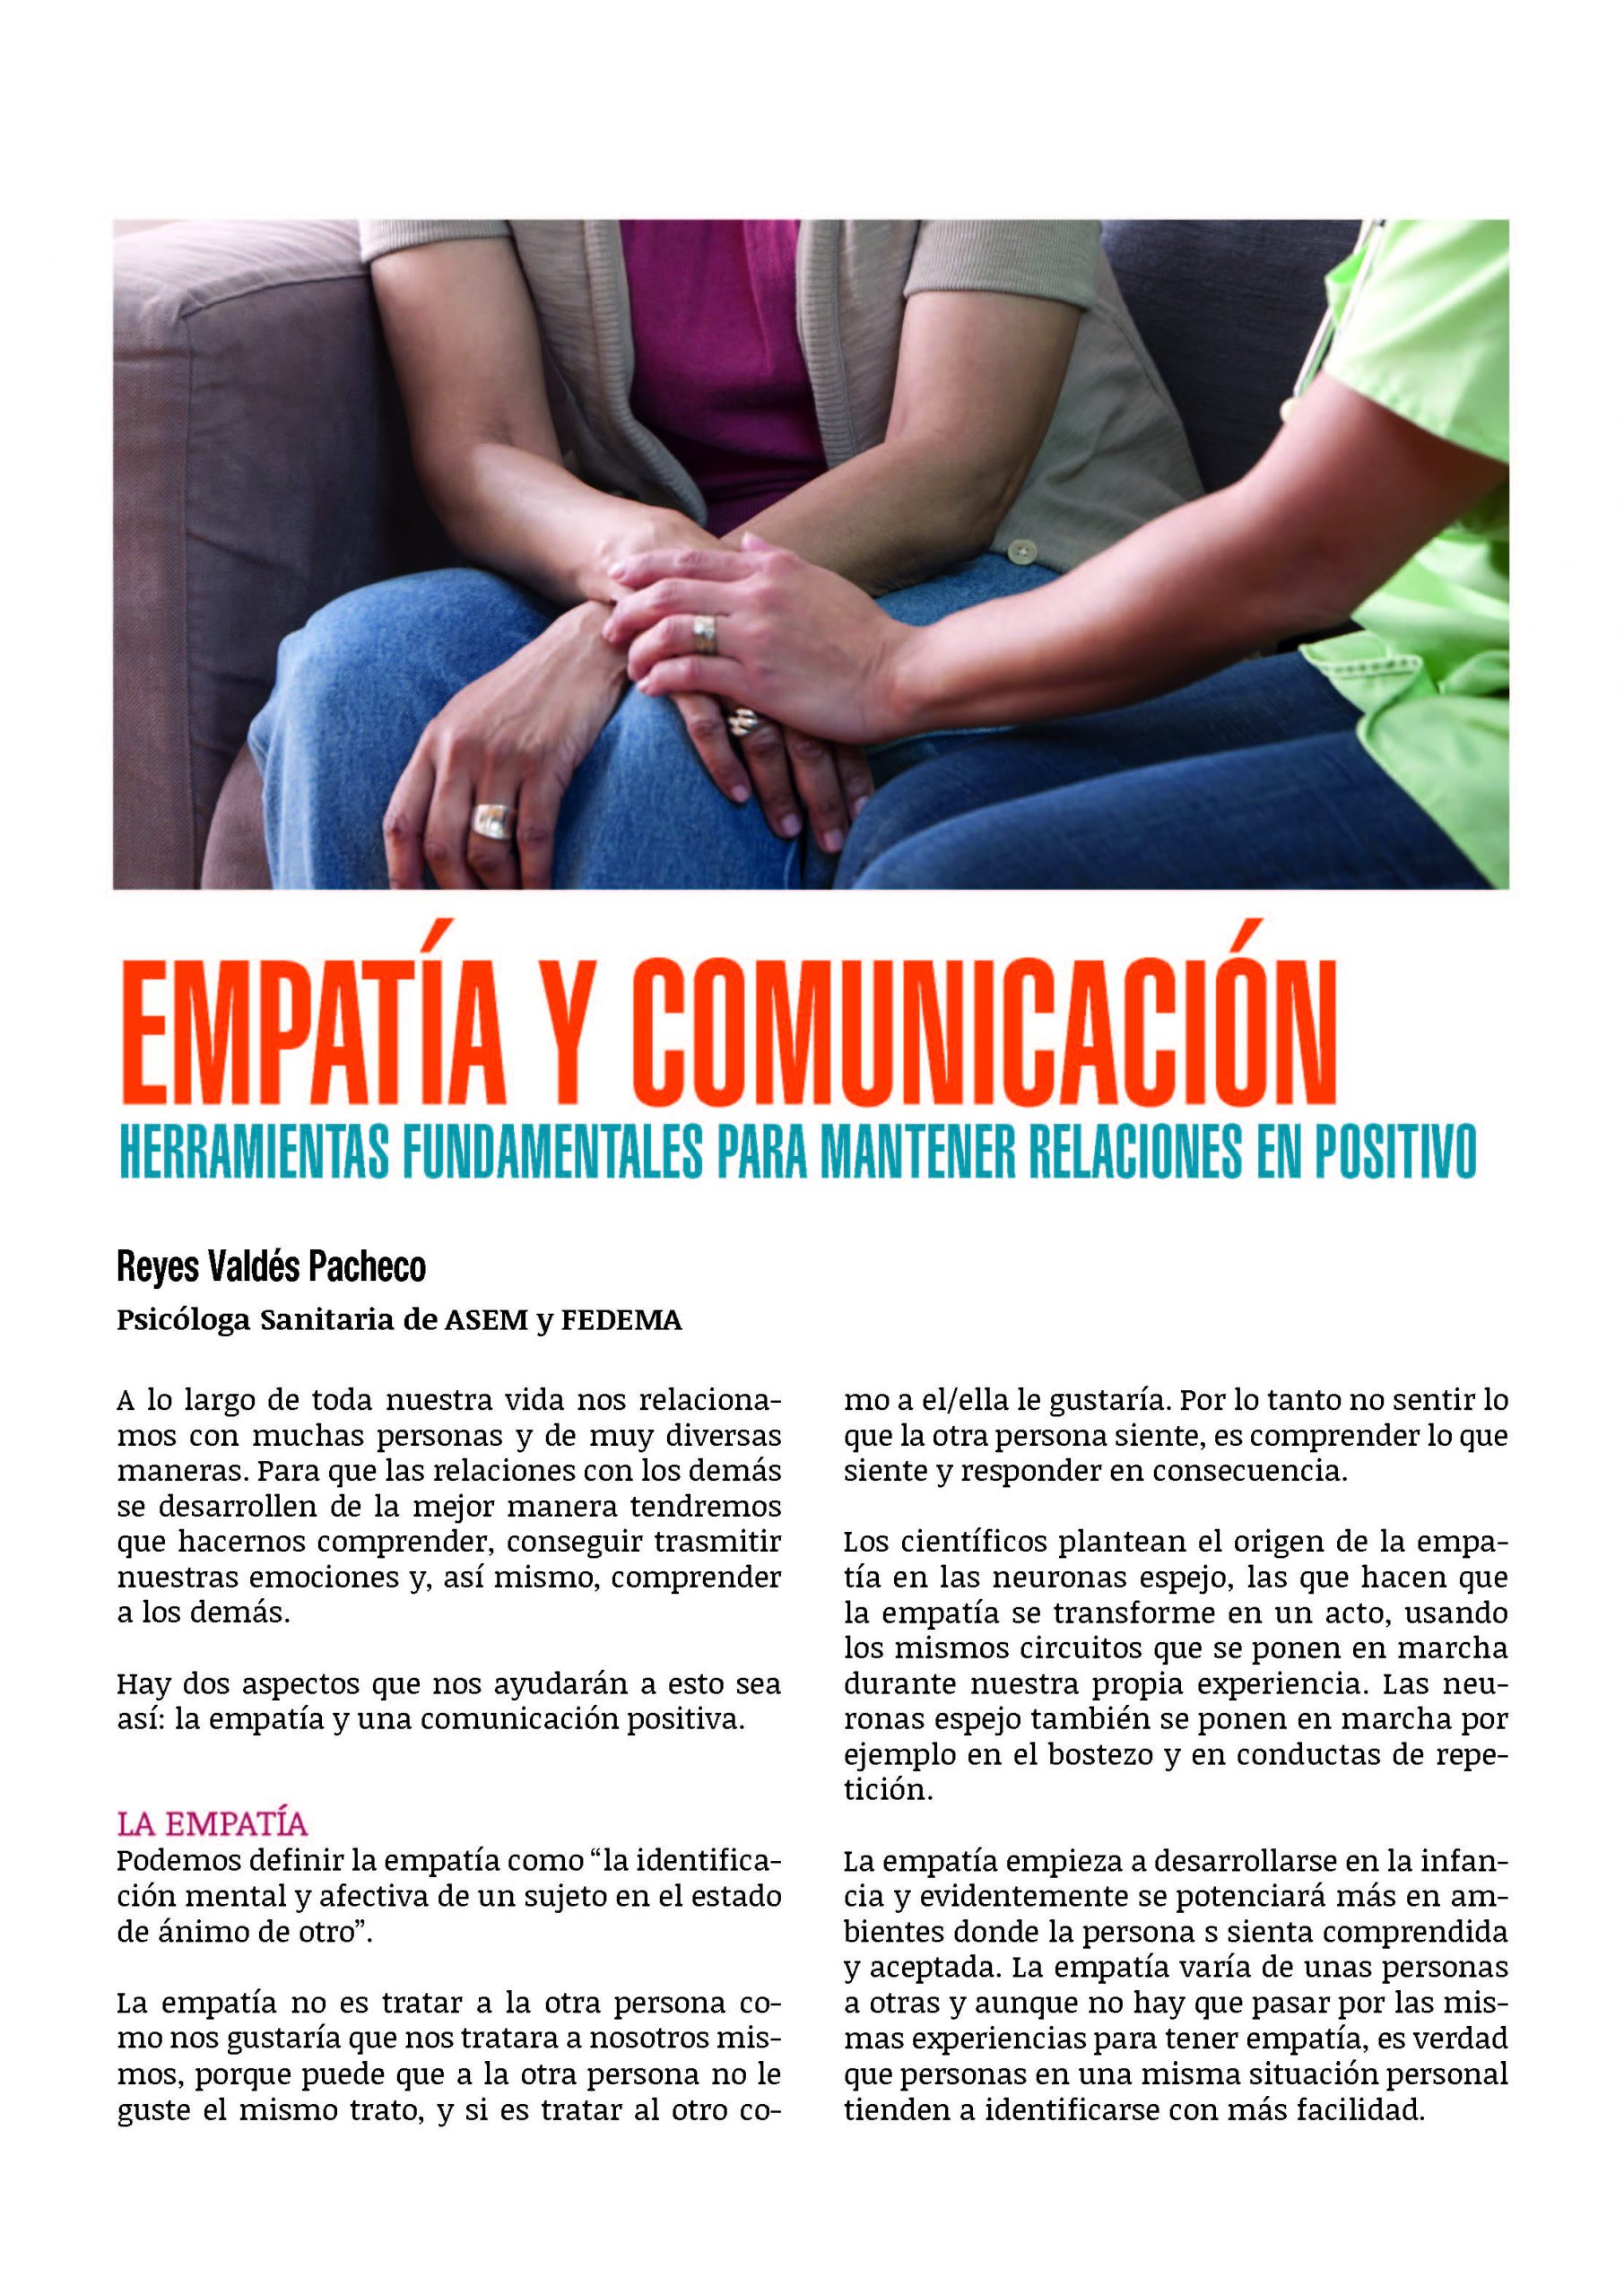 empatiaycomunicacion1.jpg